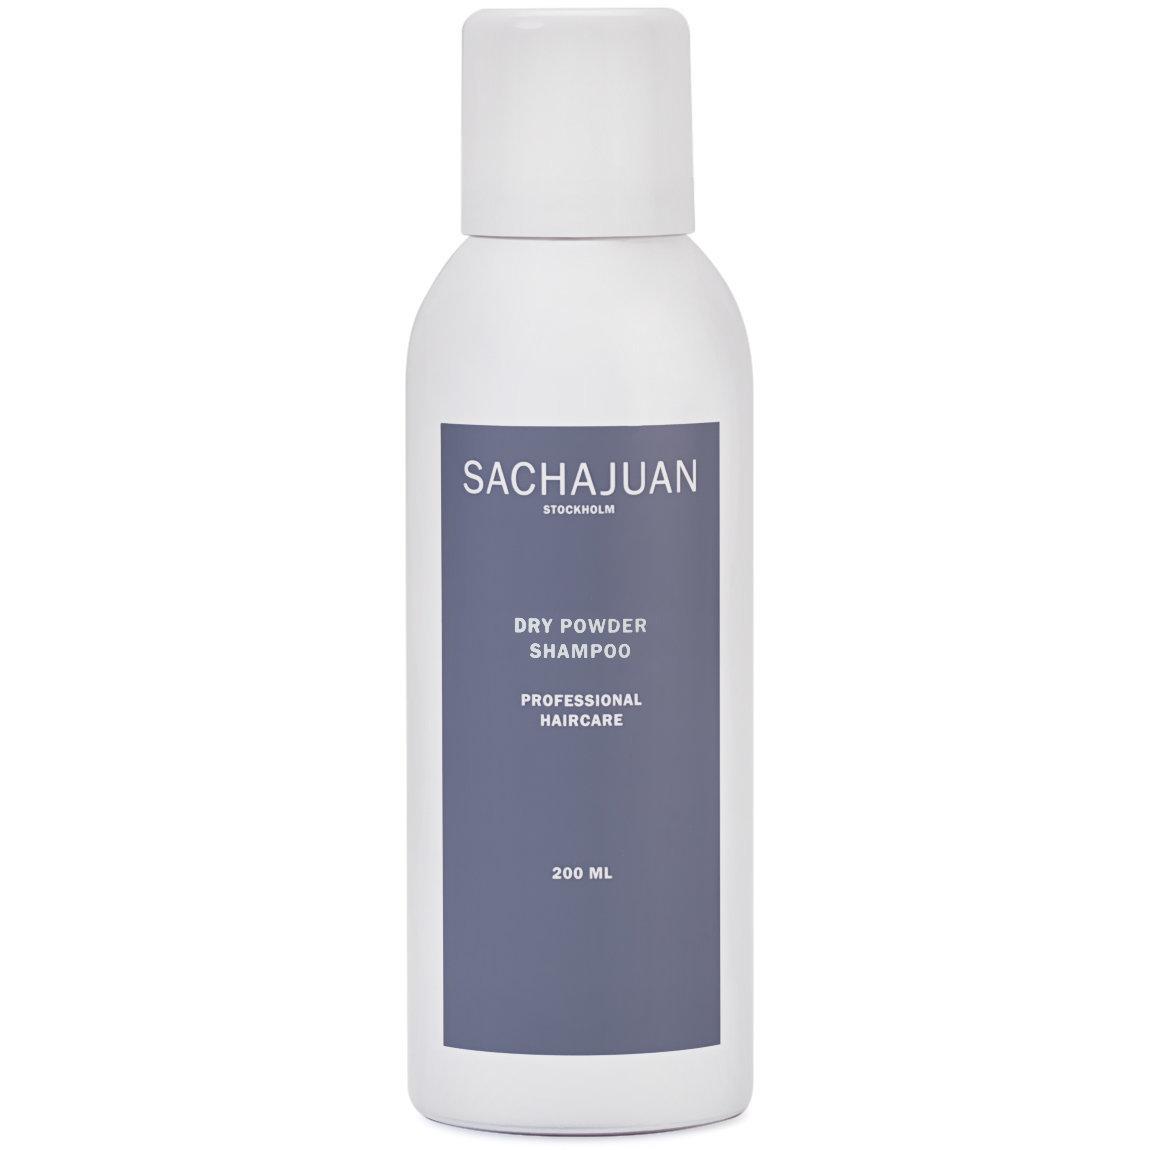 SACHAJUAN Dry Powder Shampoo Original product swatch.